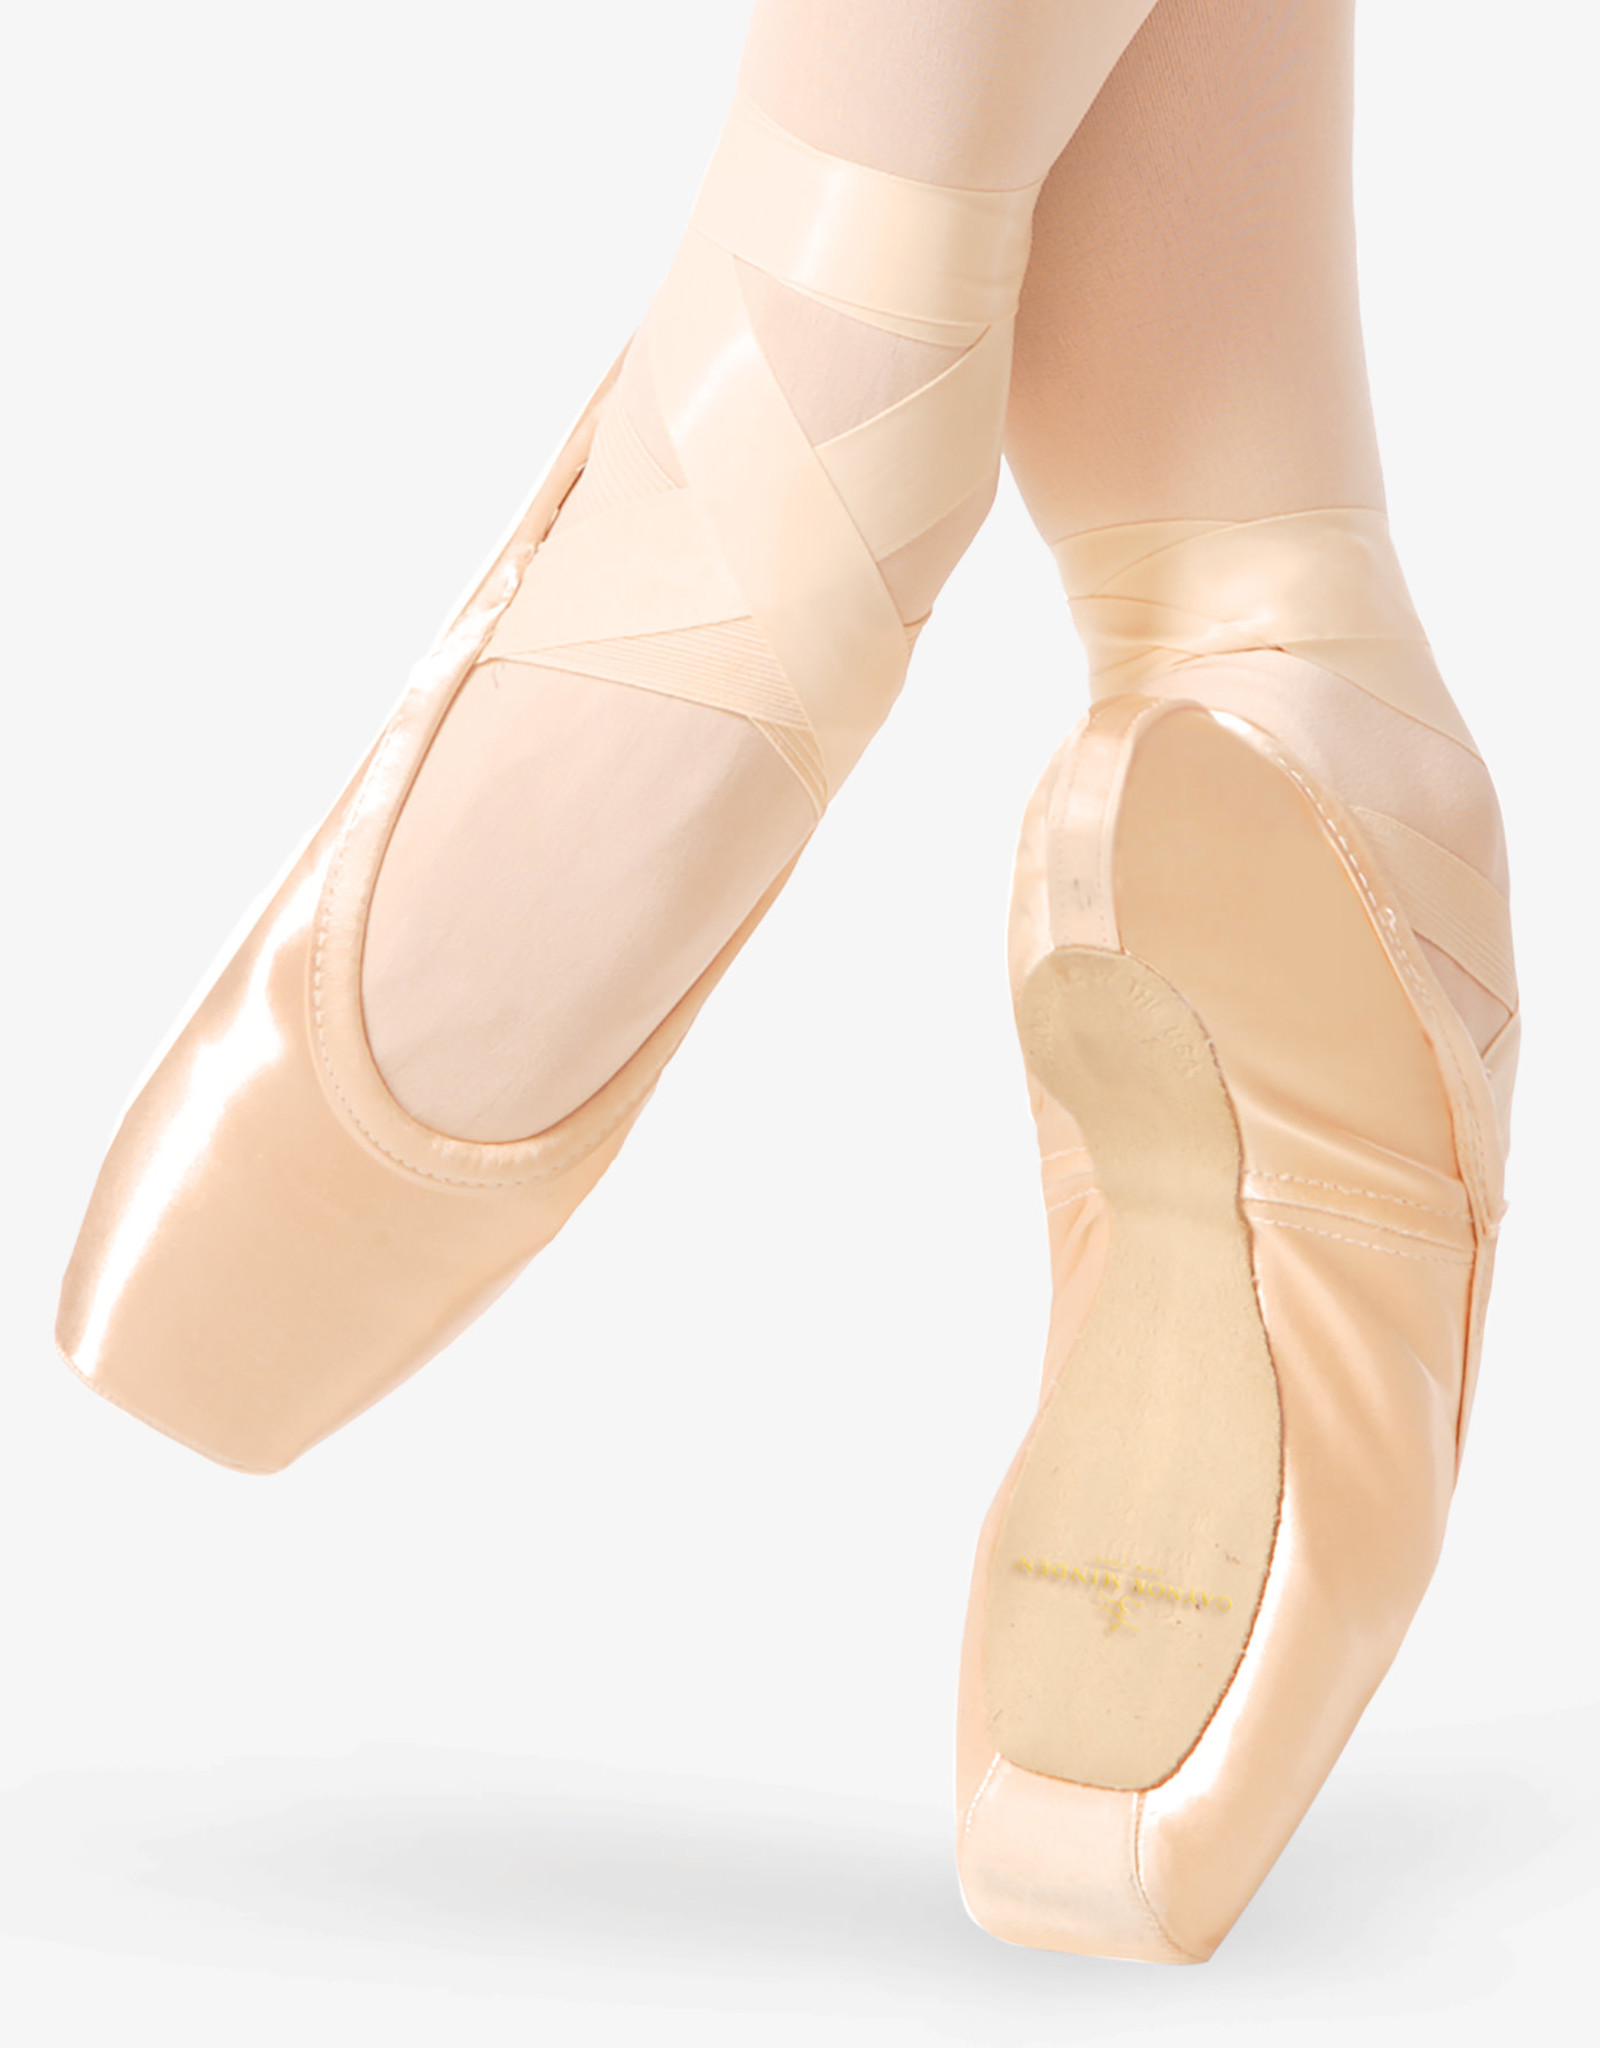 Gaynor Minden Gaynor Minden Classic Fit Pointe Shoe